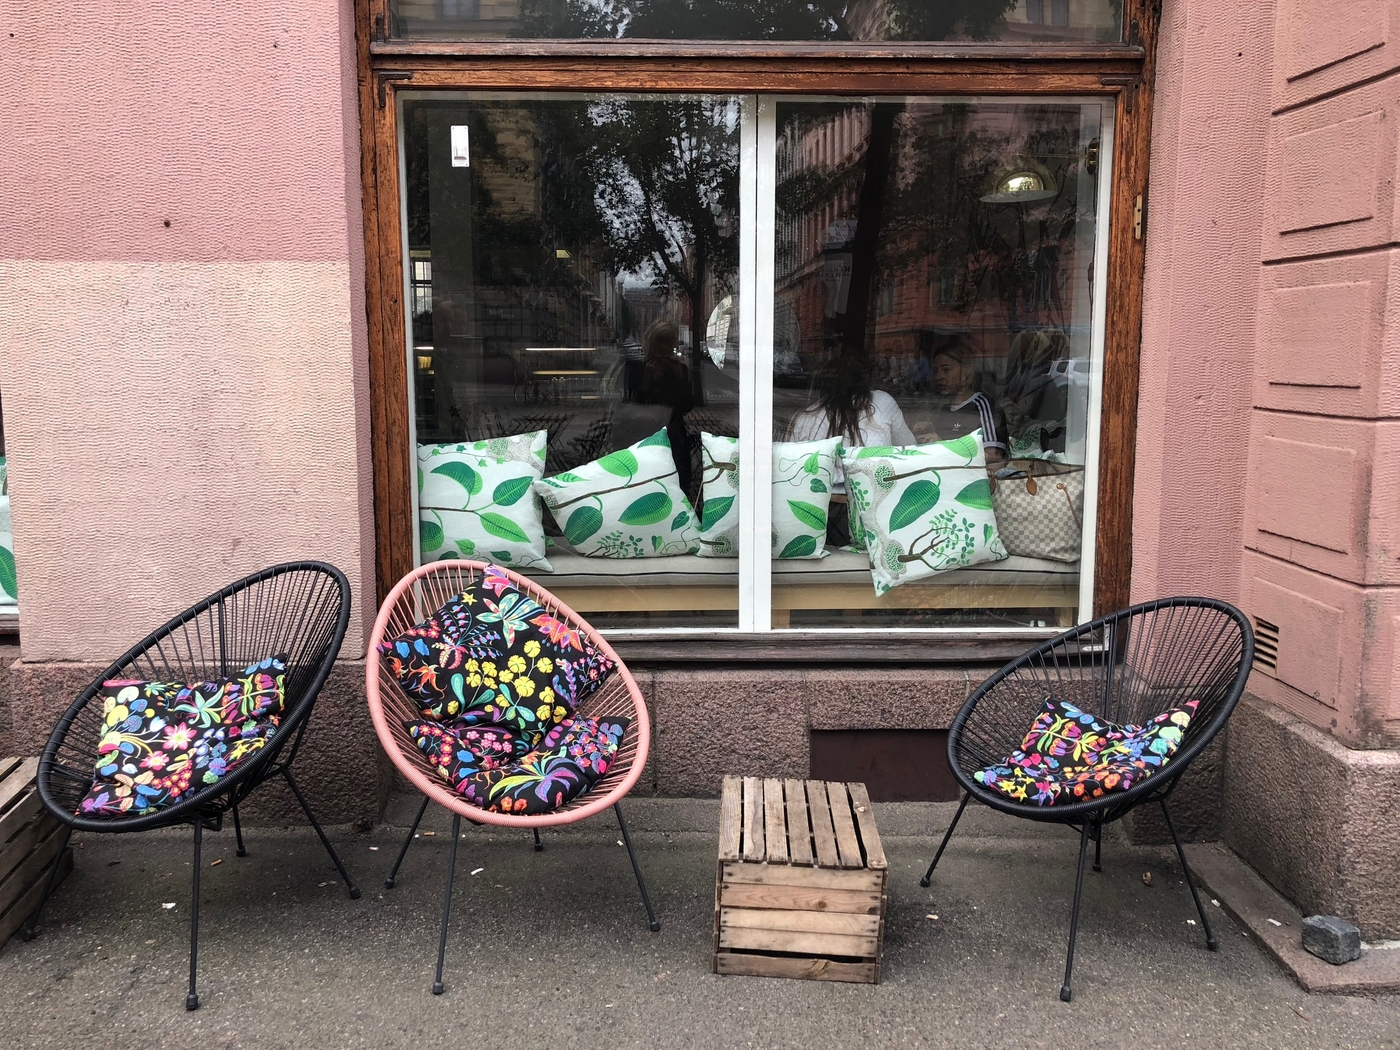 Punavuoren sympaattisin kahvila, Green Hippo Cafe